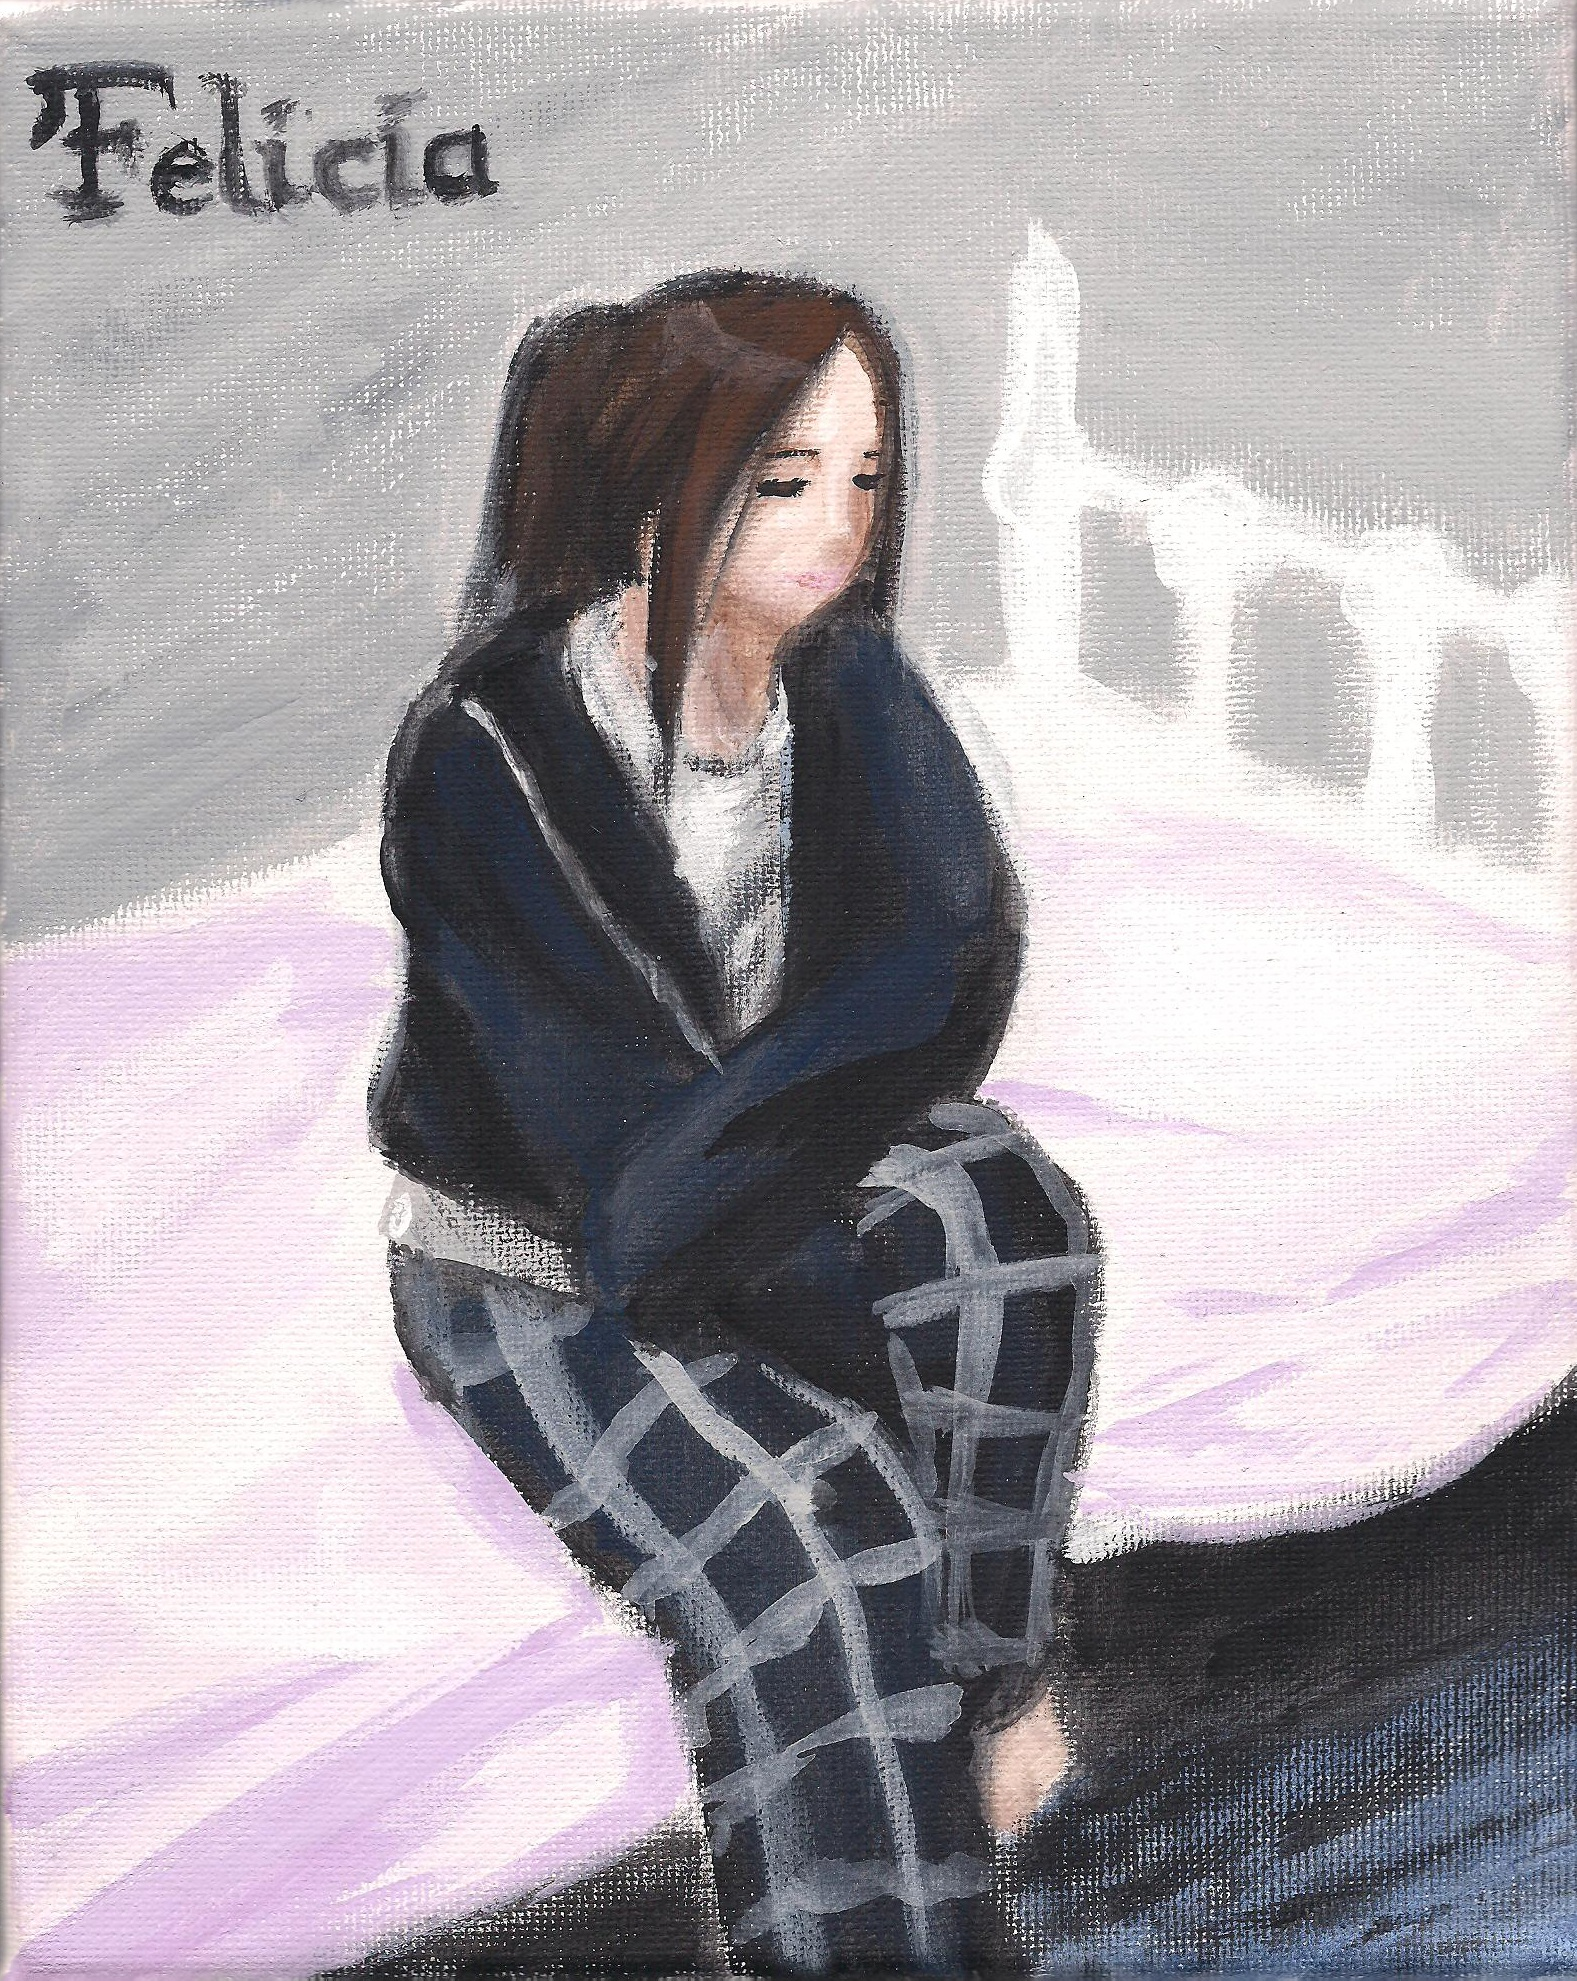 Felicia (acrylic painting#2)